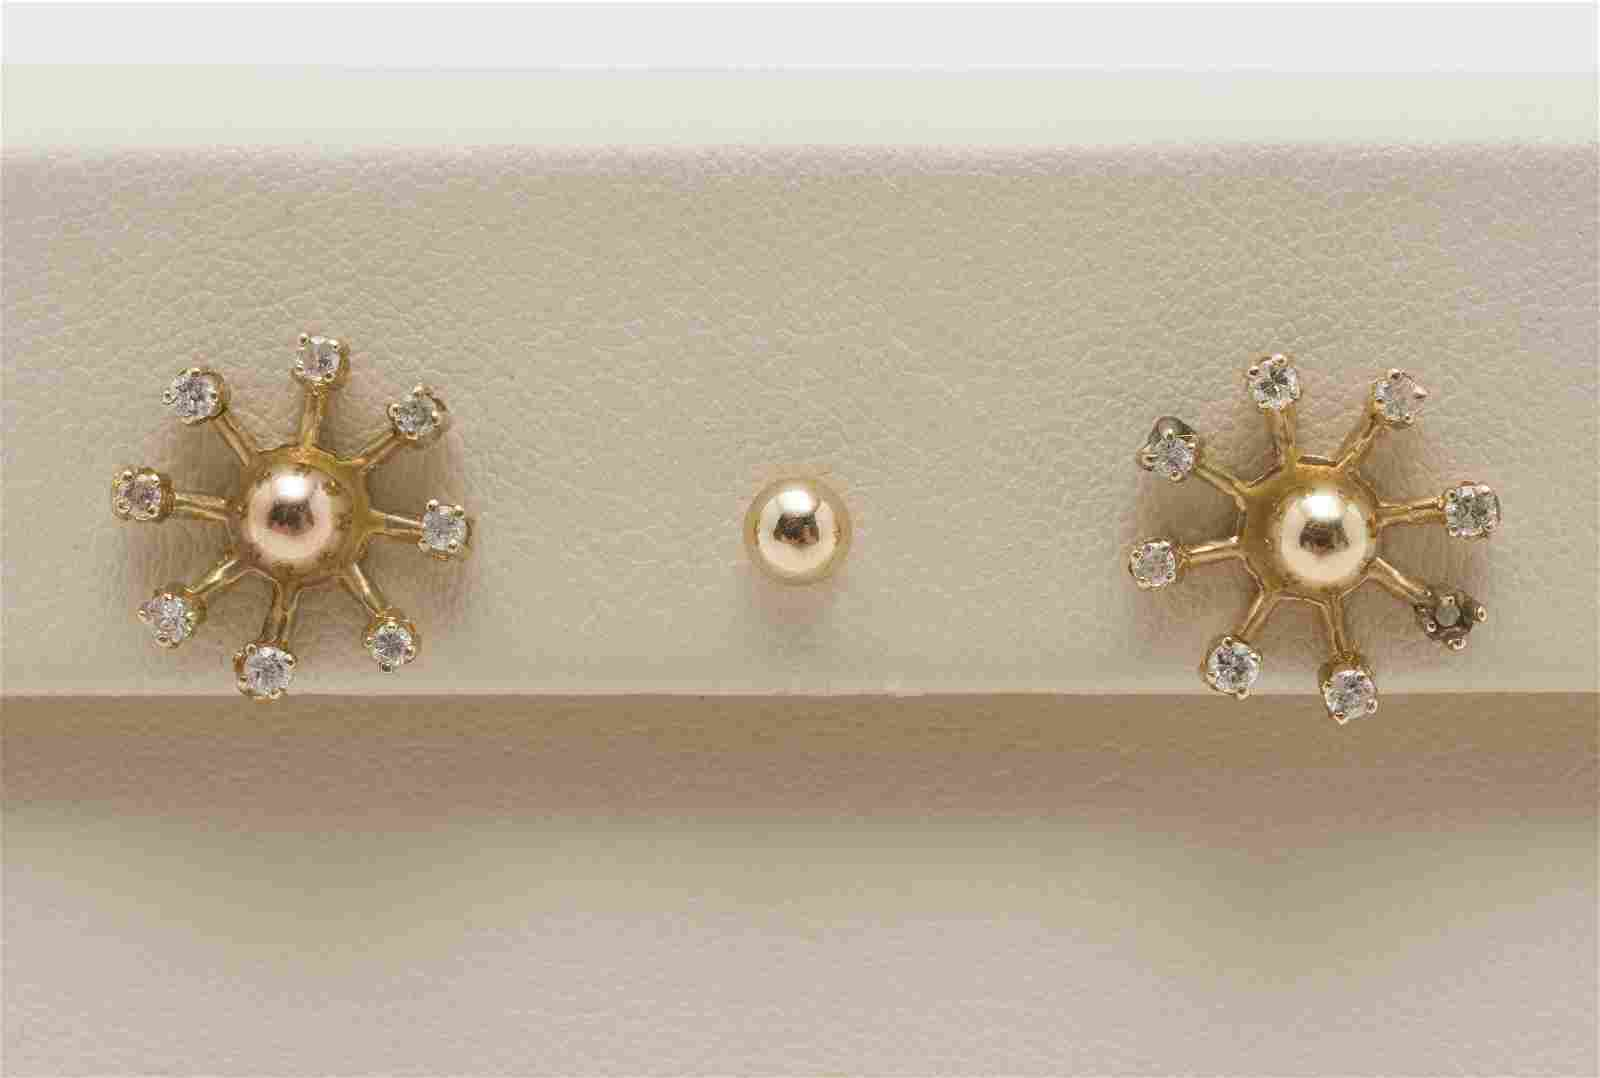 5 Pcs 14k and Diamond Jewelry